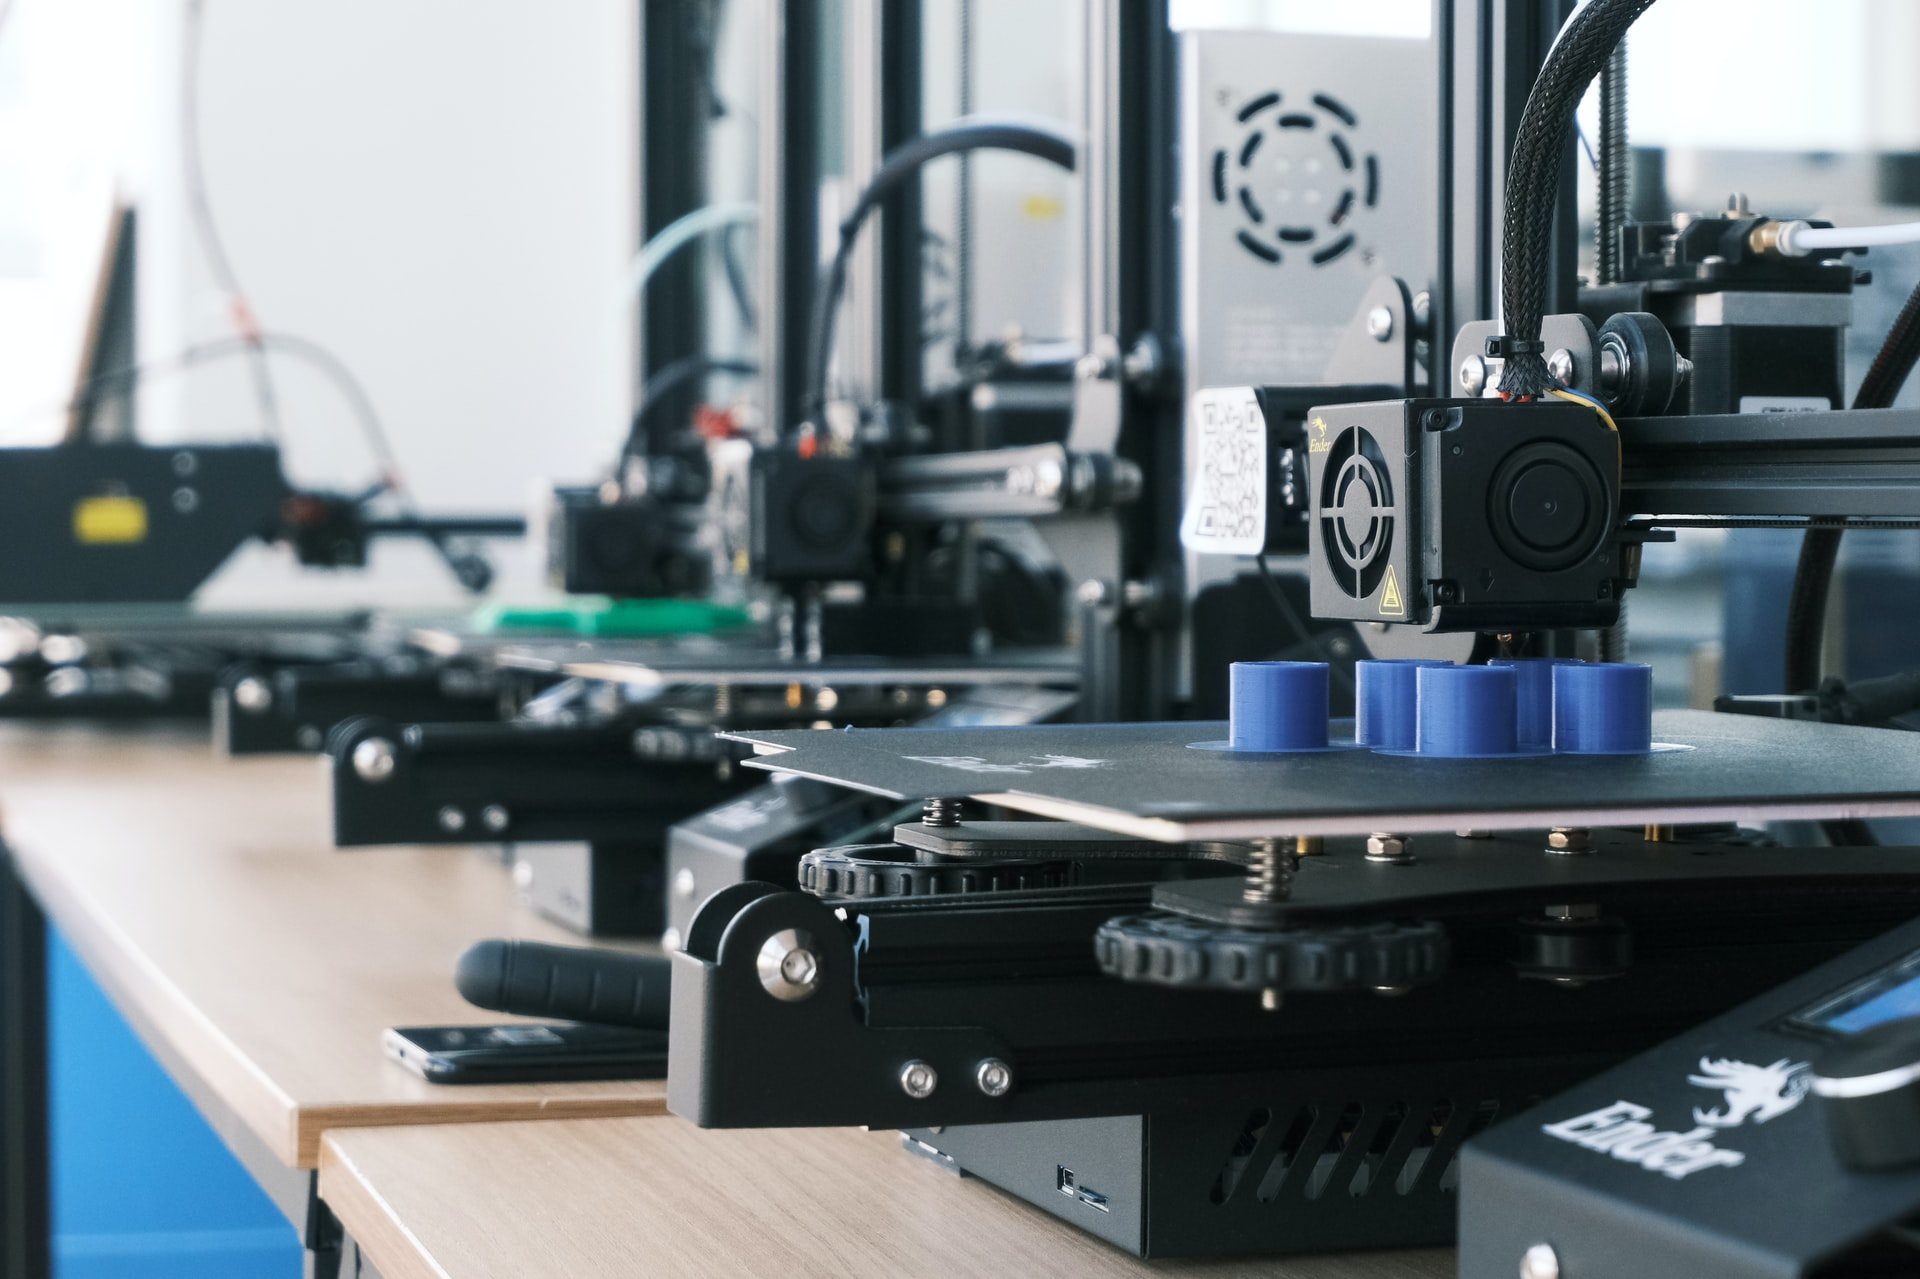 3d printer on a table